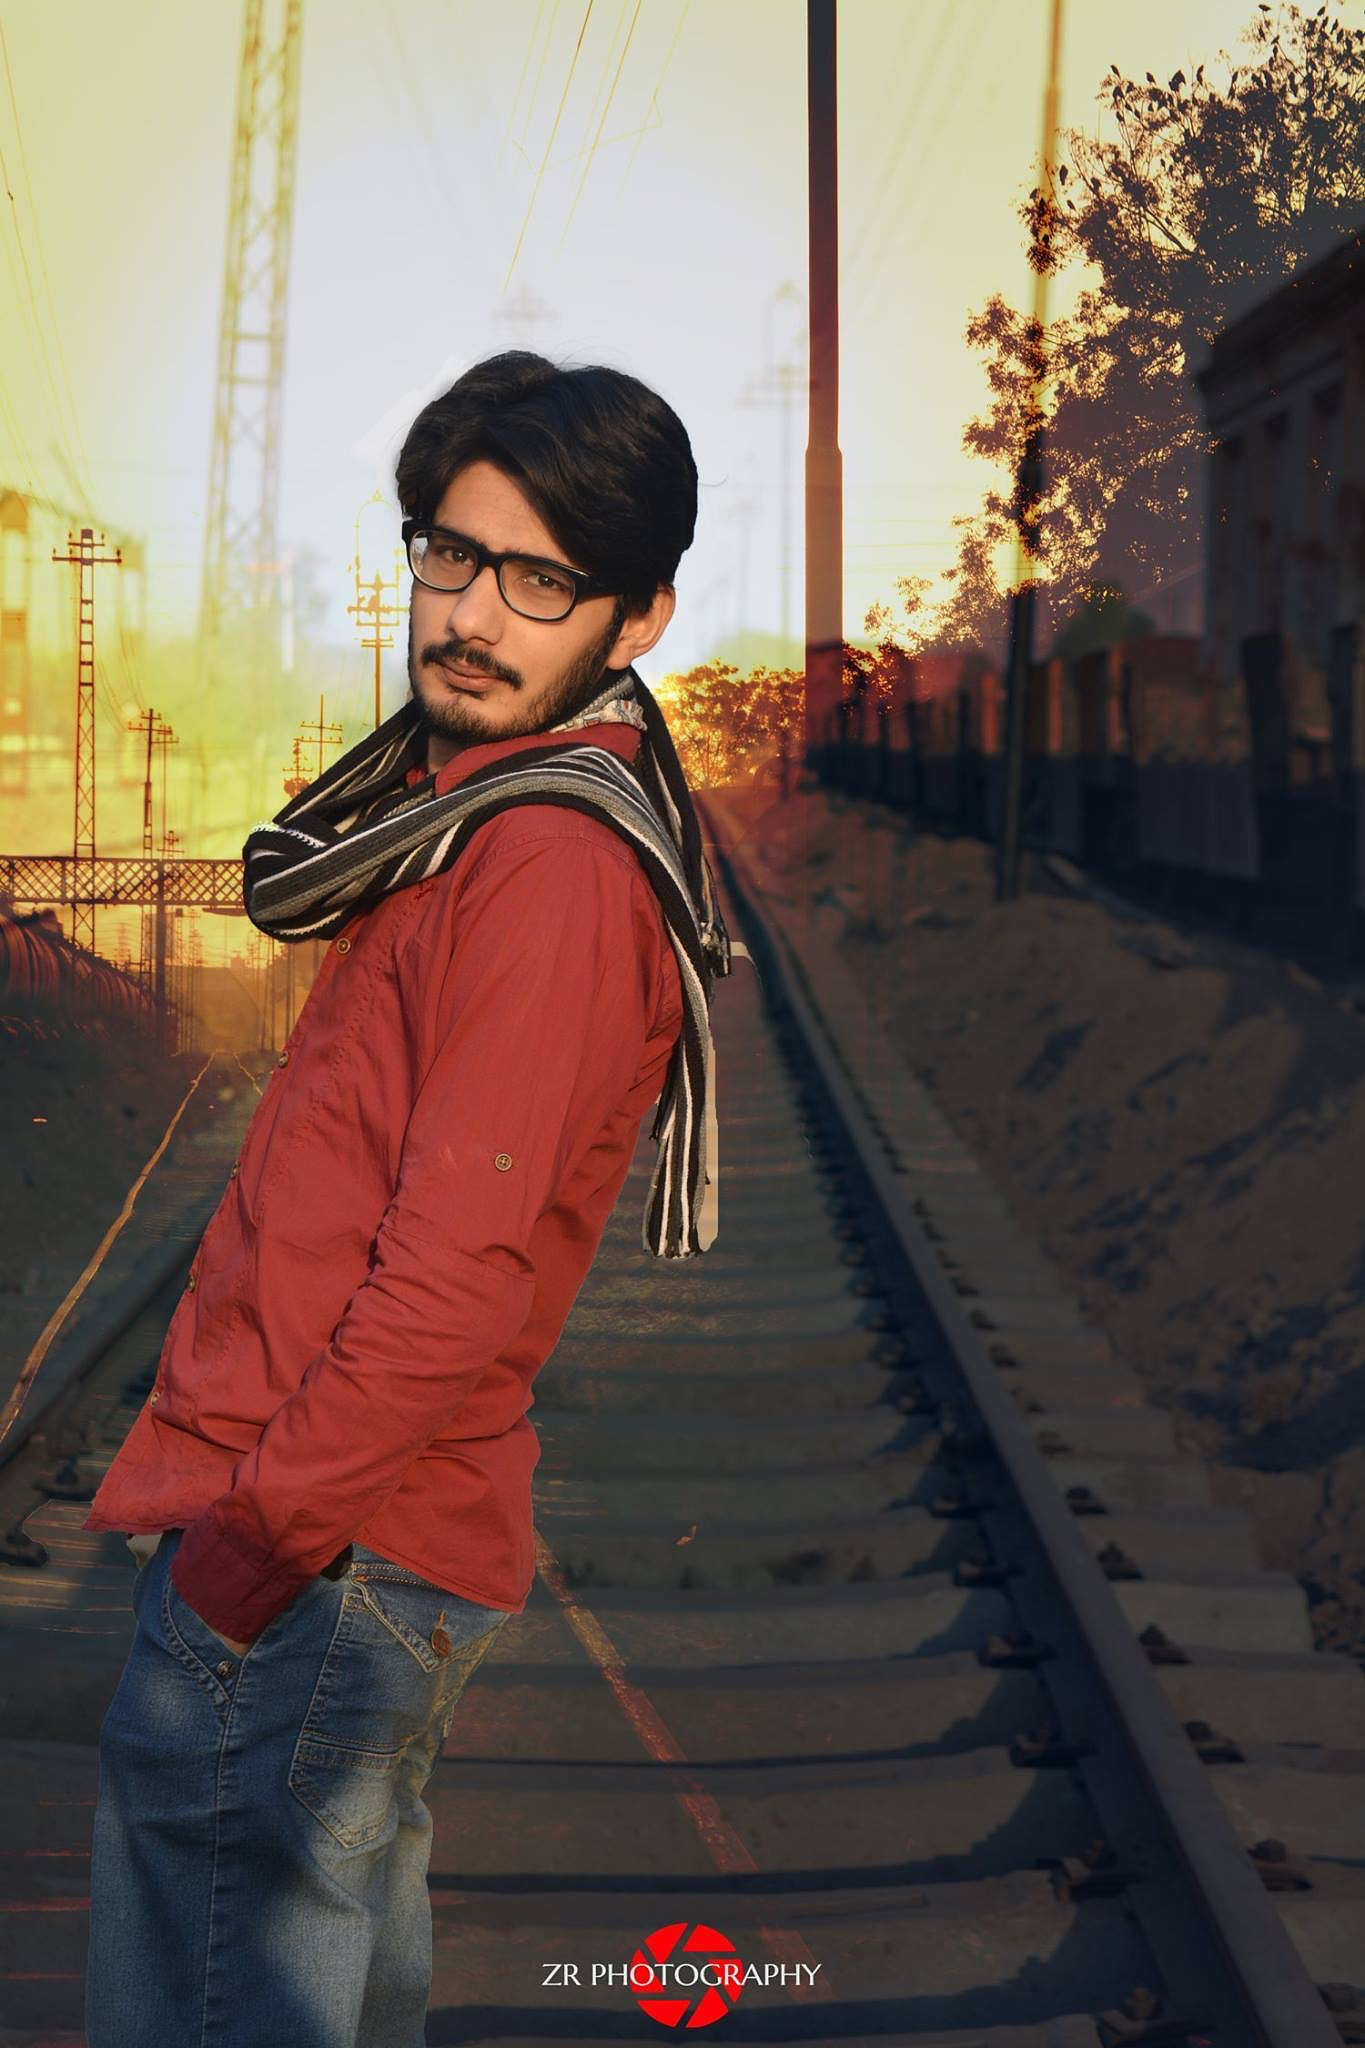 Double exposure a little effect by Syed Zain Raza Zaidi